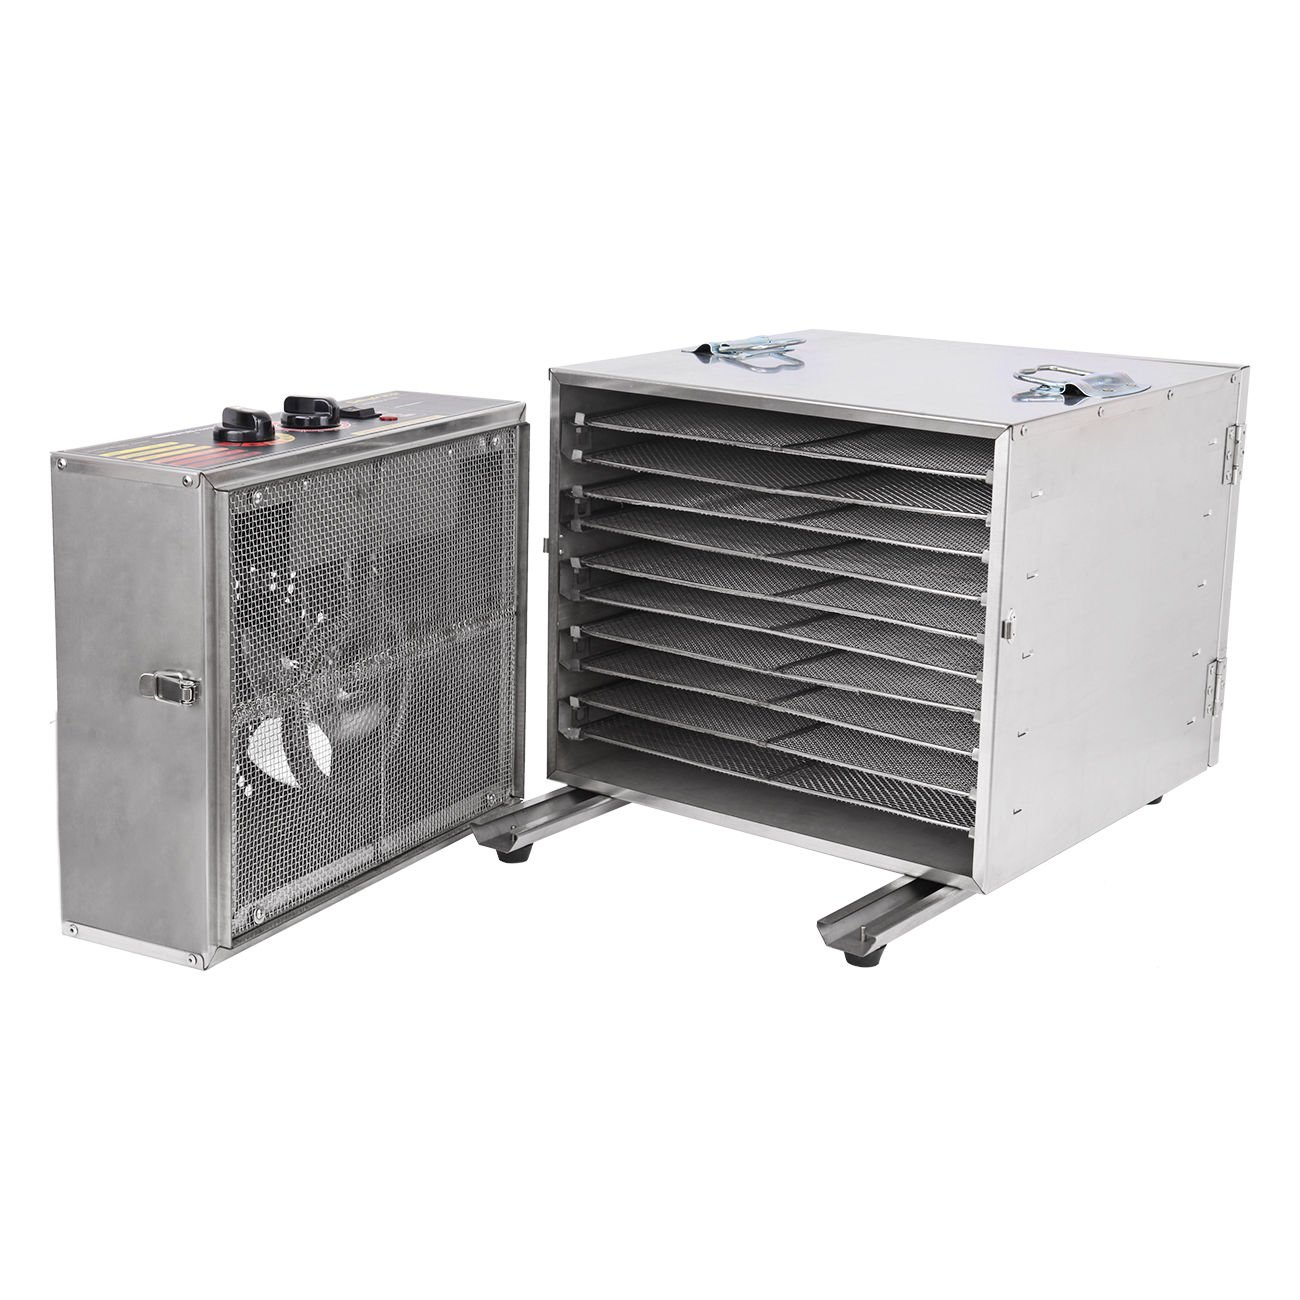 Ridgeyard 1000W Dehydrator Commercial Grade Stainless Steel Digital Food Dehydrator Jerky Dryer 10 Trays 158 Degree Fahrenheit with 15 Hour Timer by Ridgeyard (Image #3)